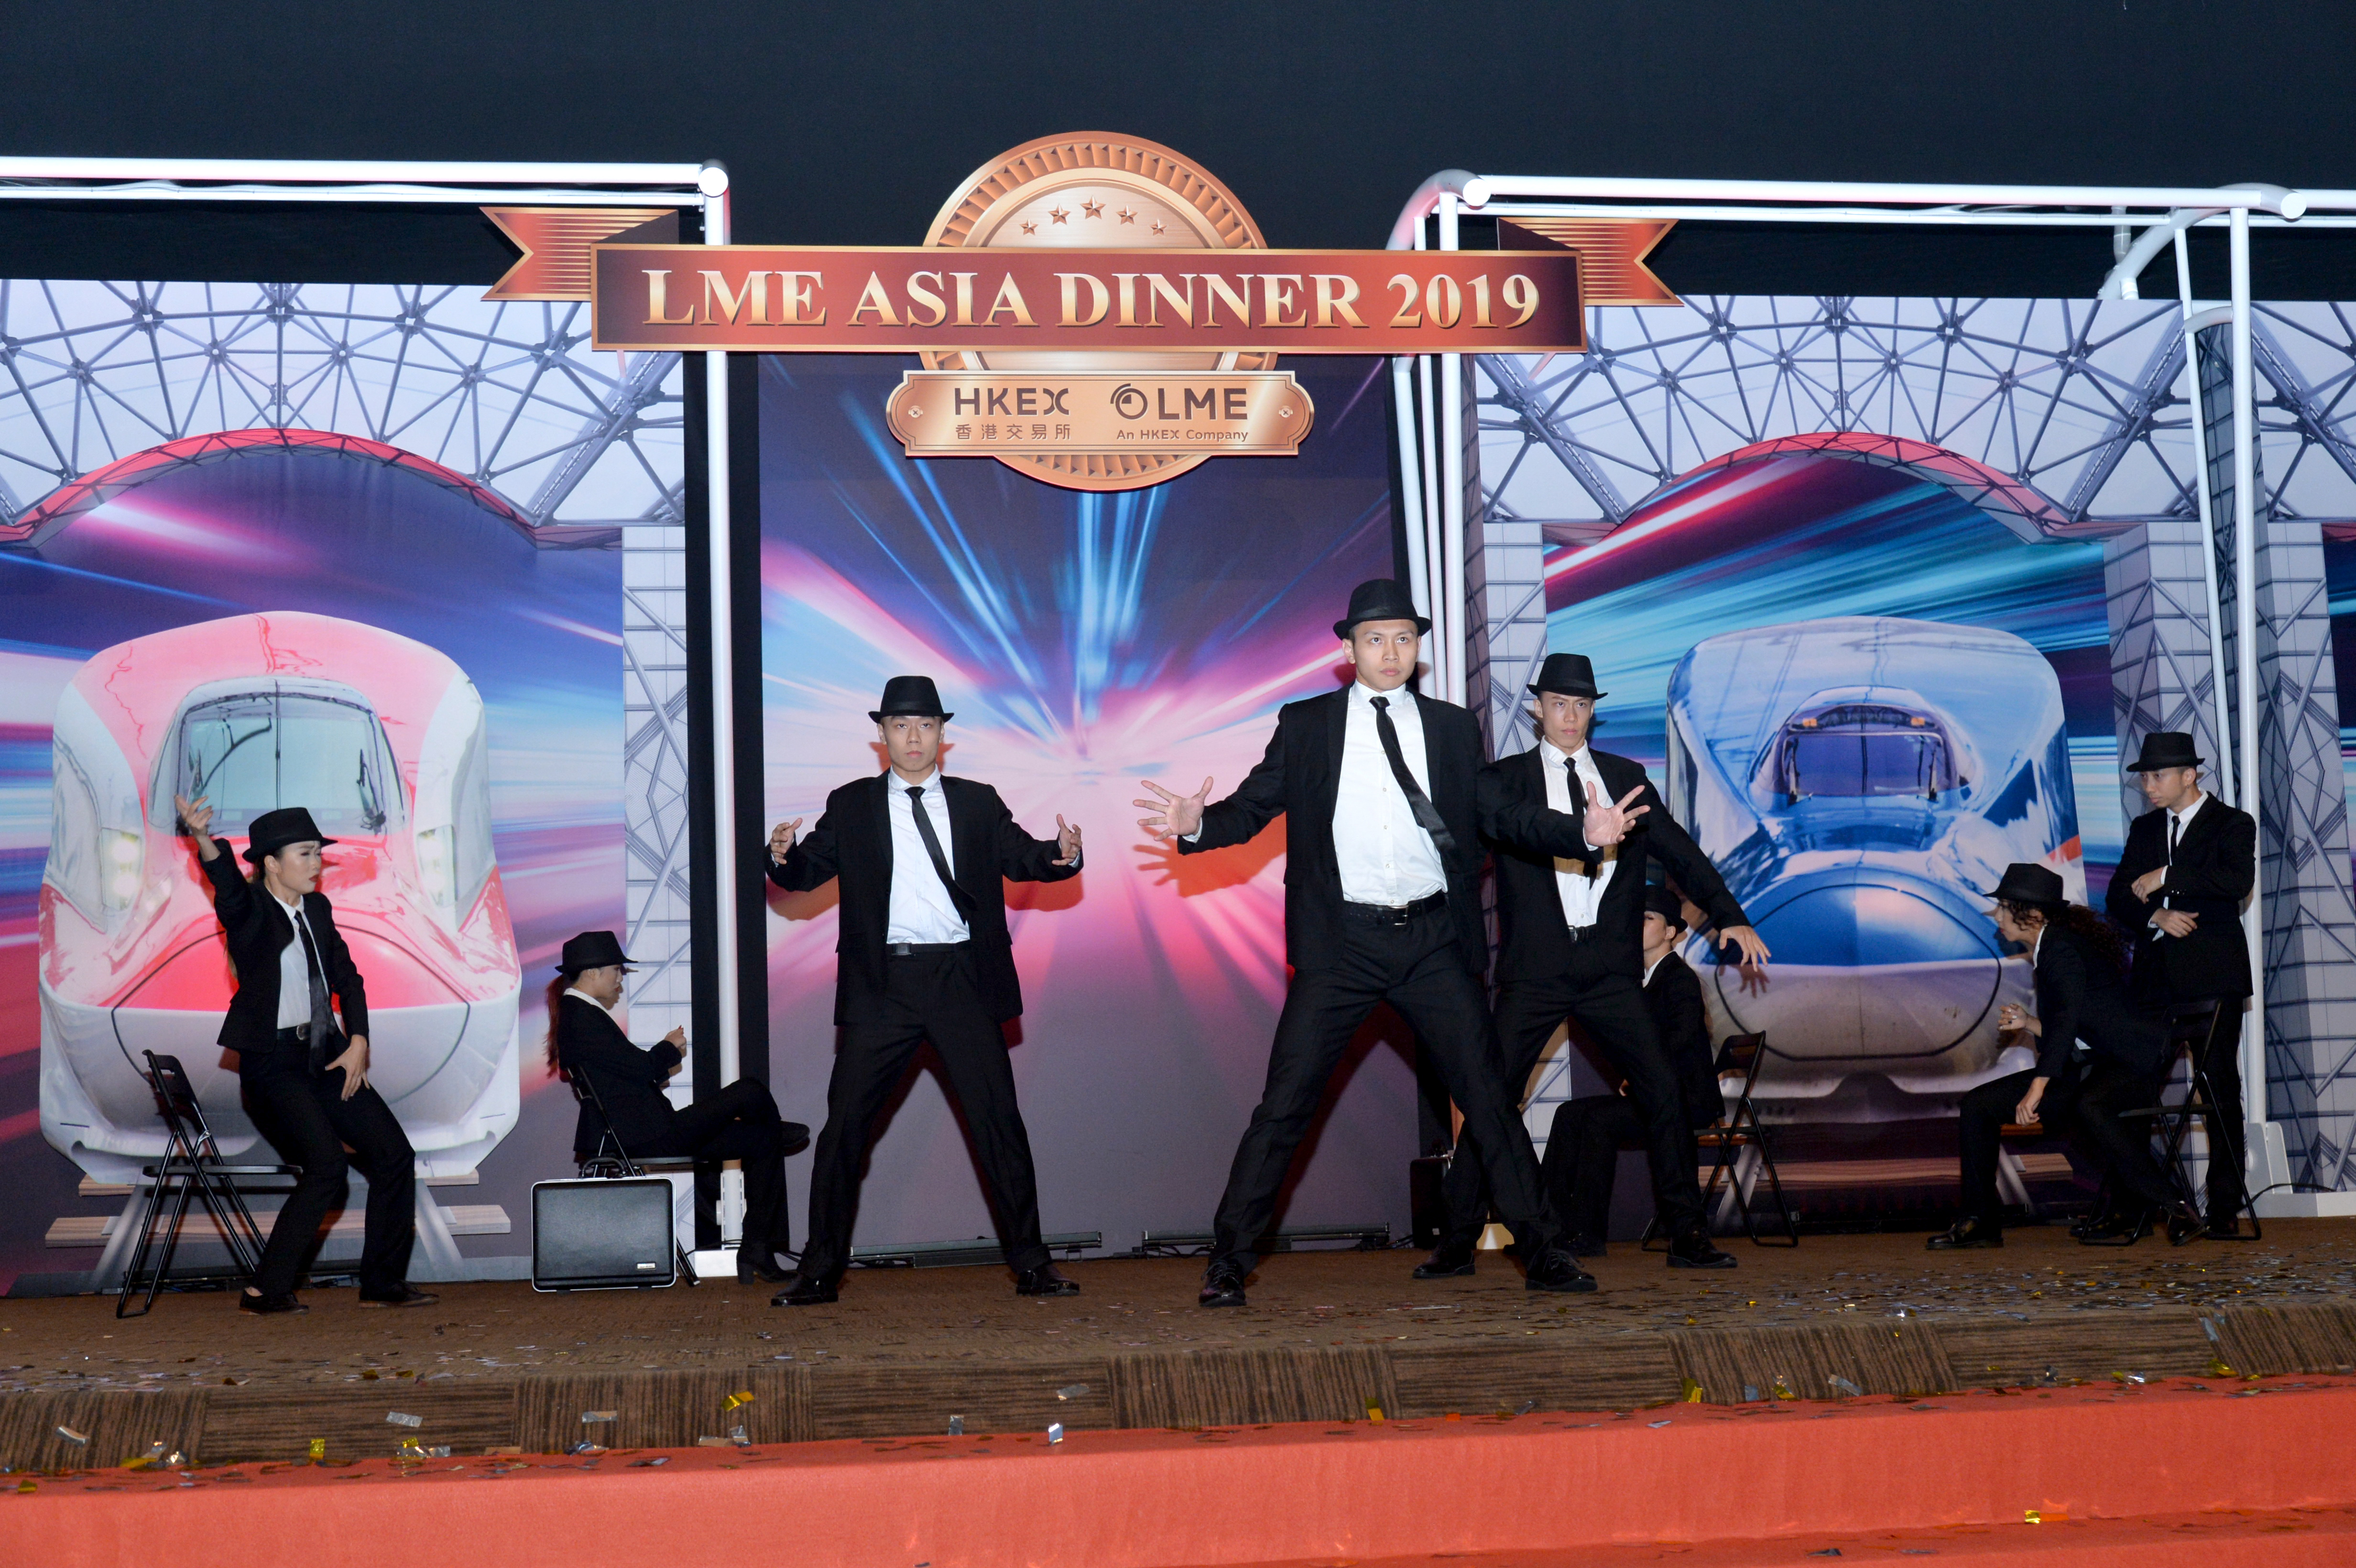 LME Asia Dinner Performance 1